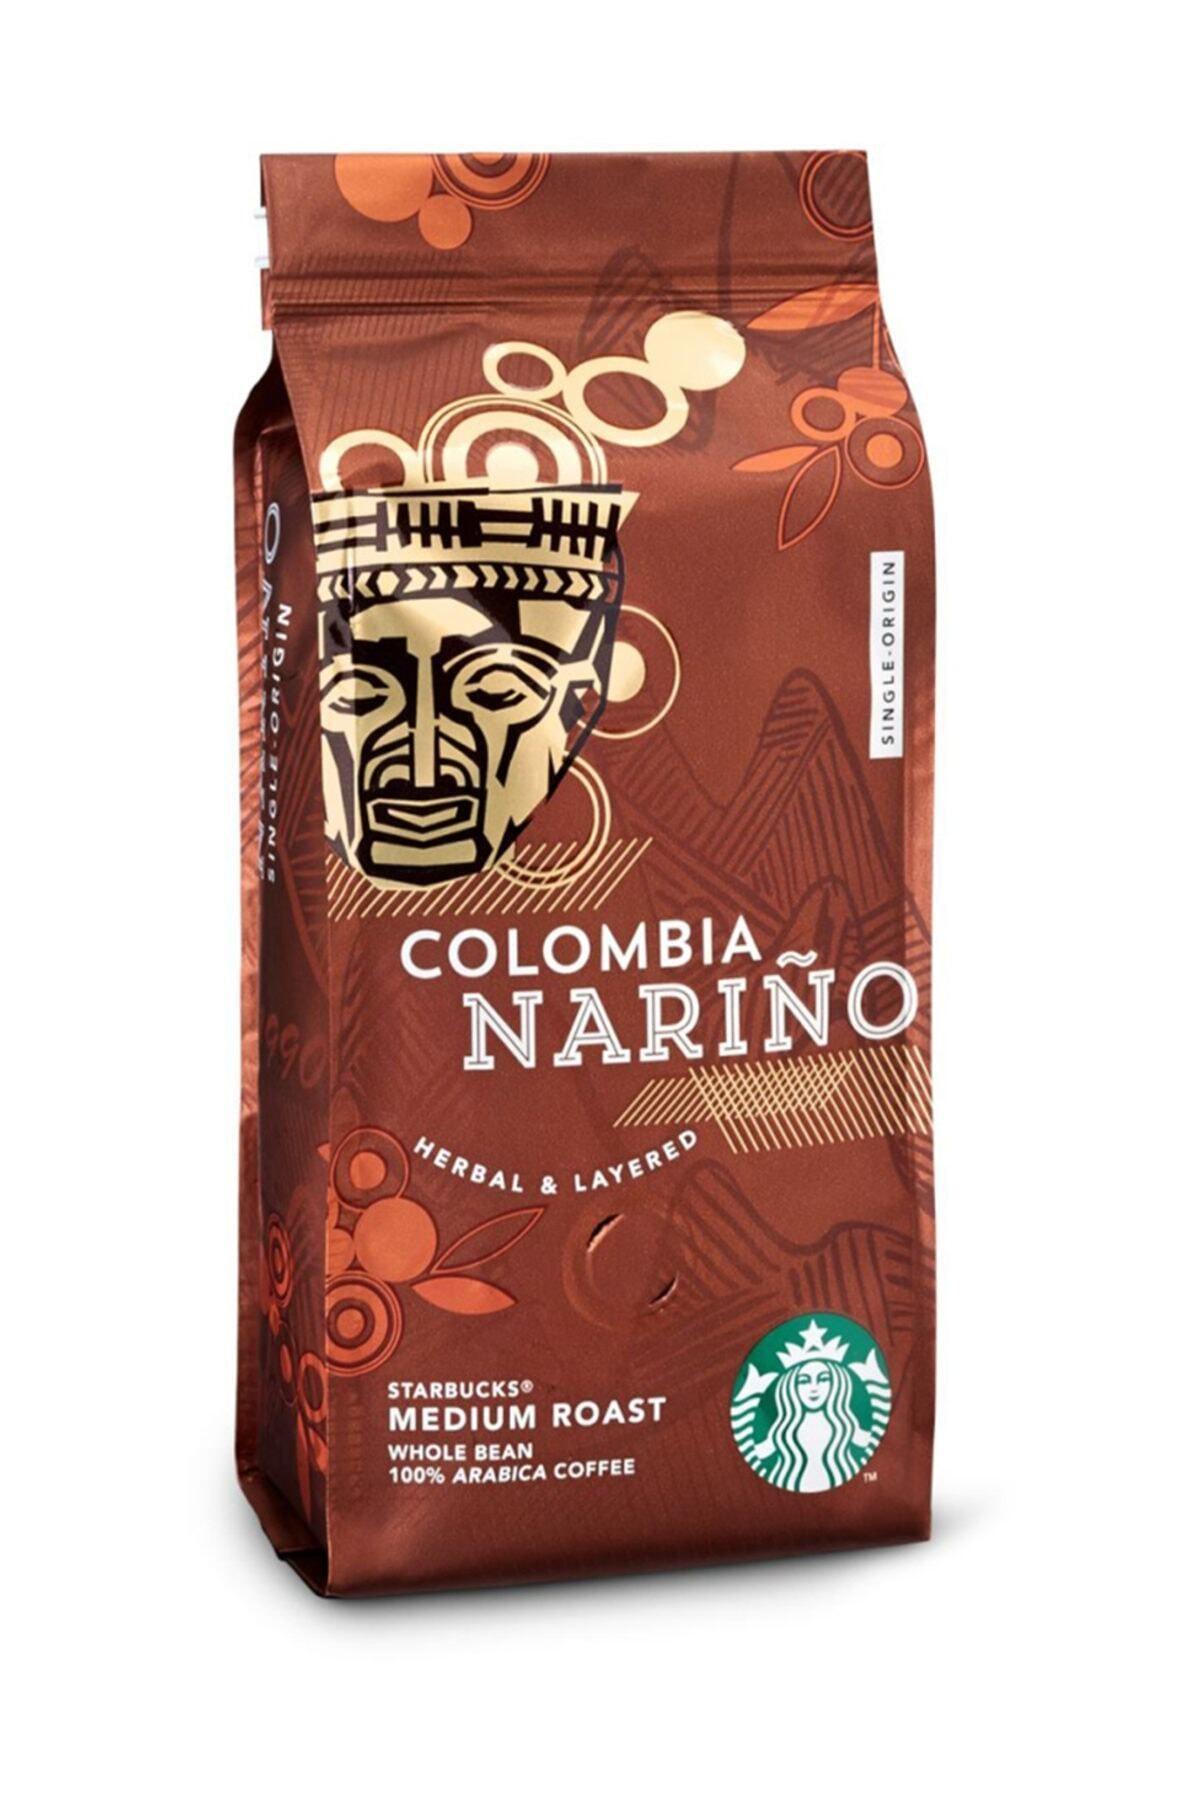 Starbucks Colombia Filtre Kahve 250 gr French Press Için Çekilmiş 1